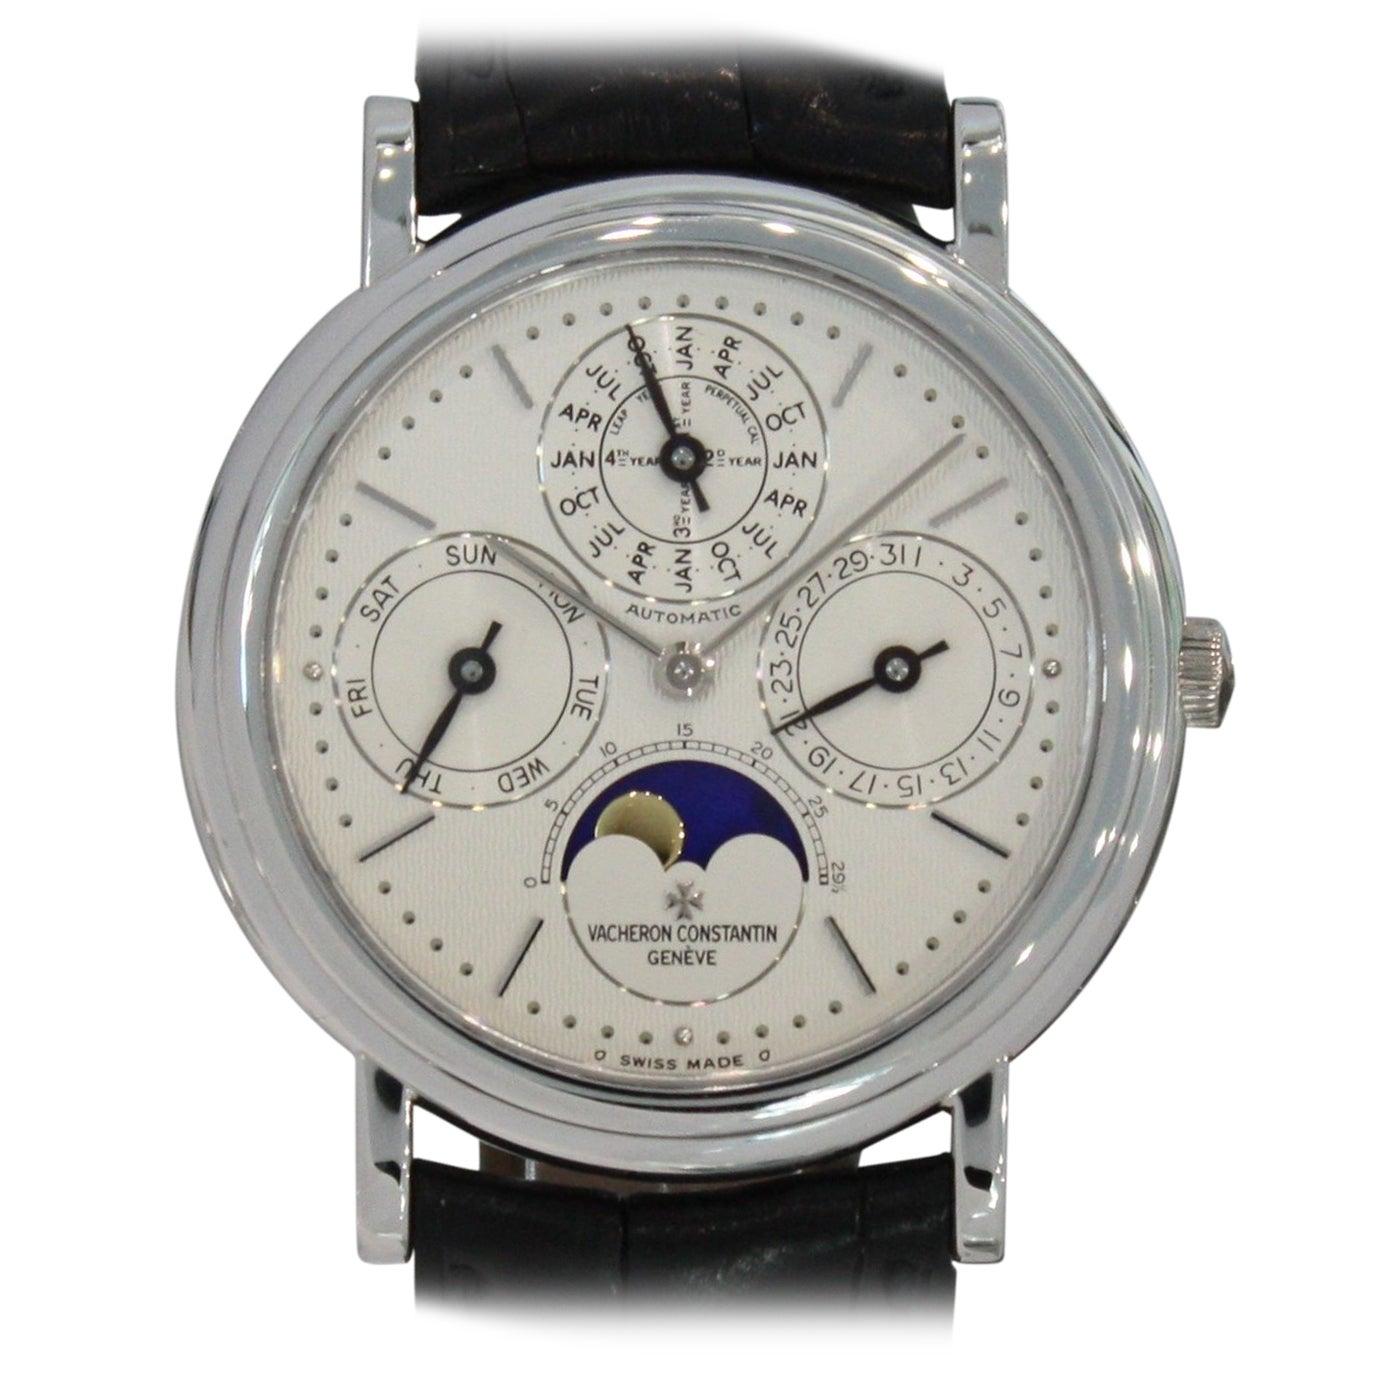 55fab4a94 Vacheron Constantin Platinum Patrimony Perpetual Calendar Moon Phase  Wristwatch at 1stdibs